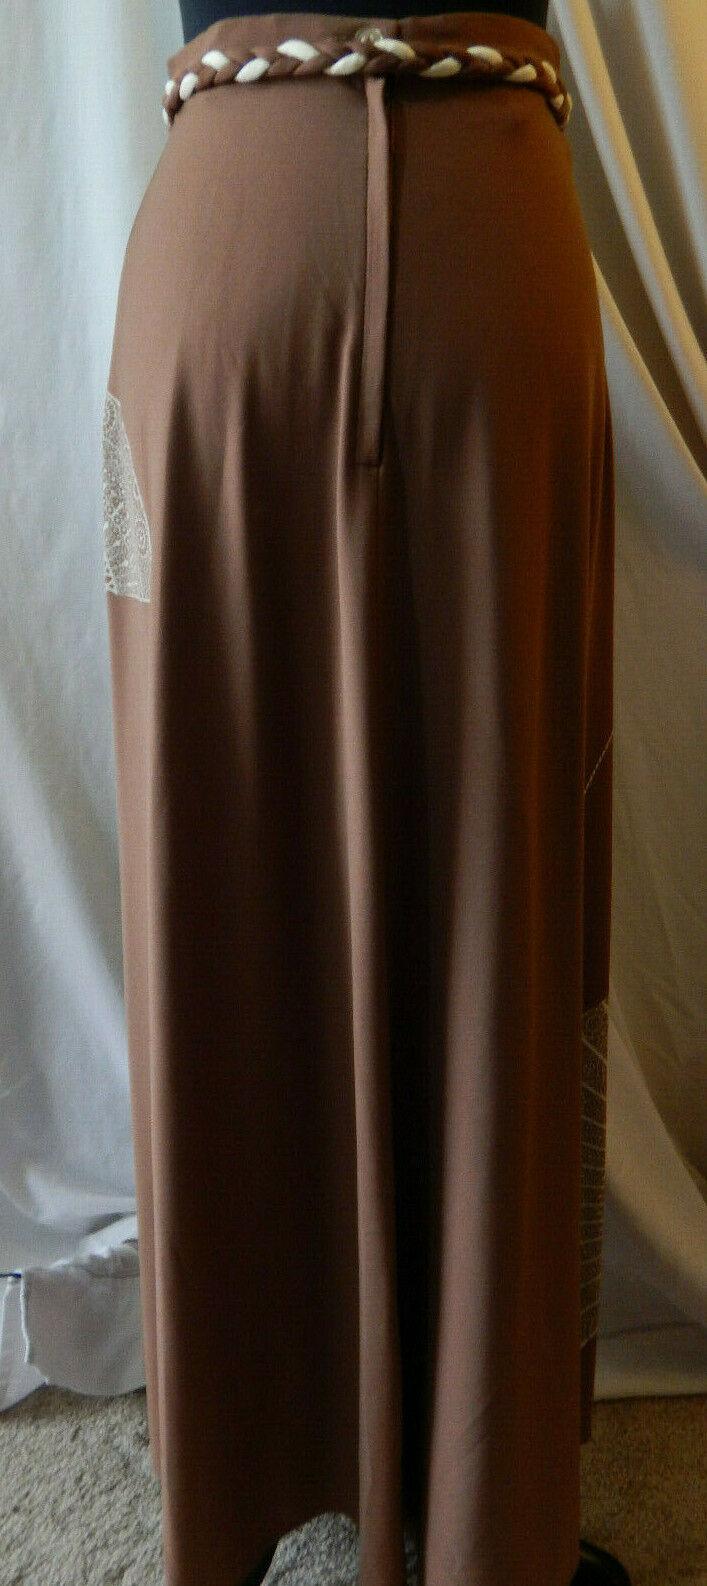 Vintage Miss Shaheen Skirt - image 2